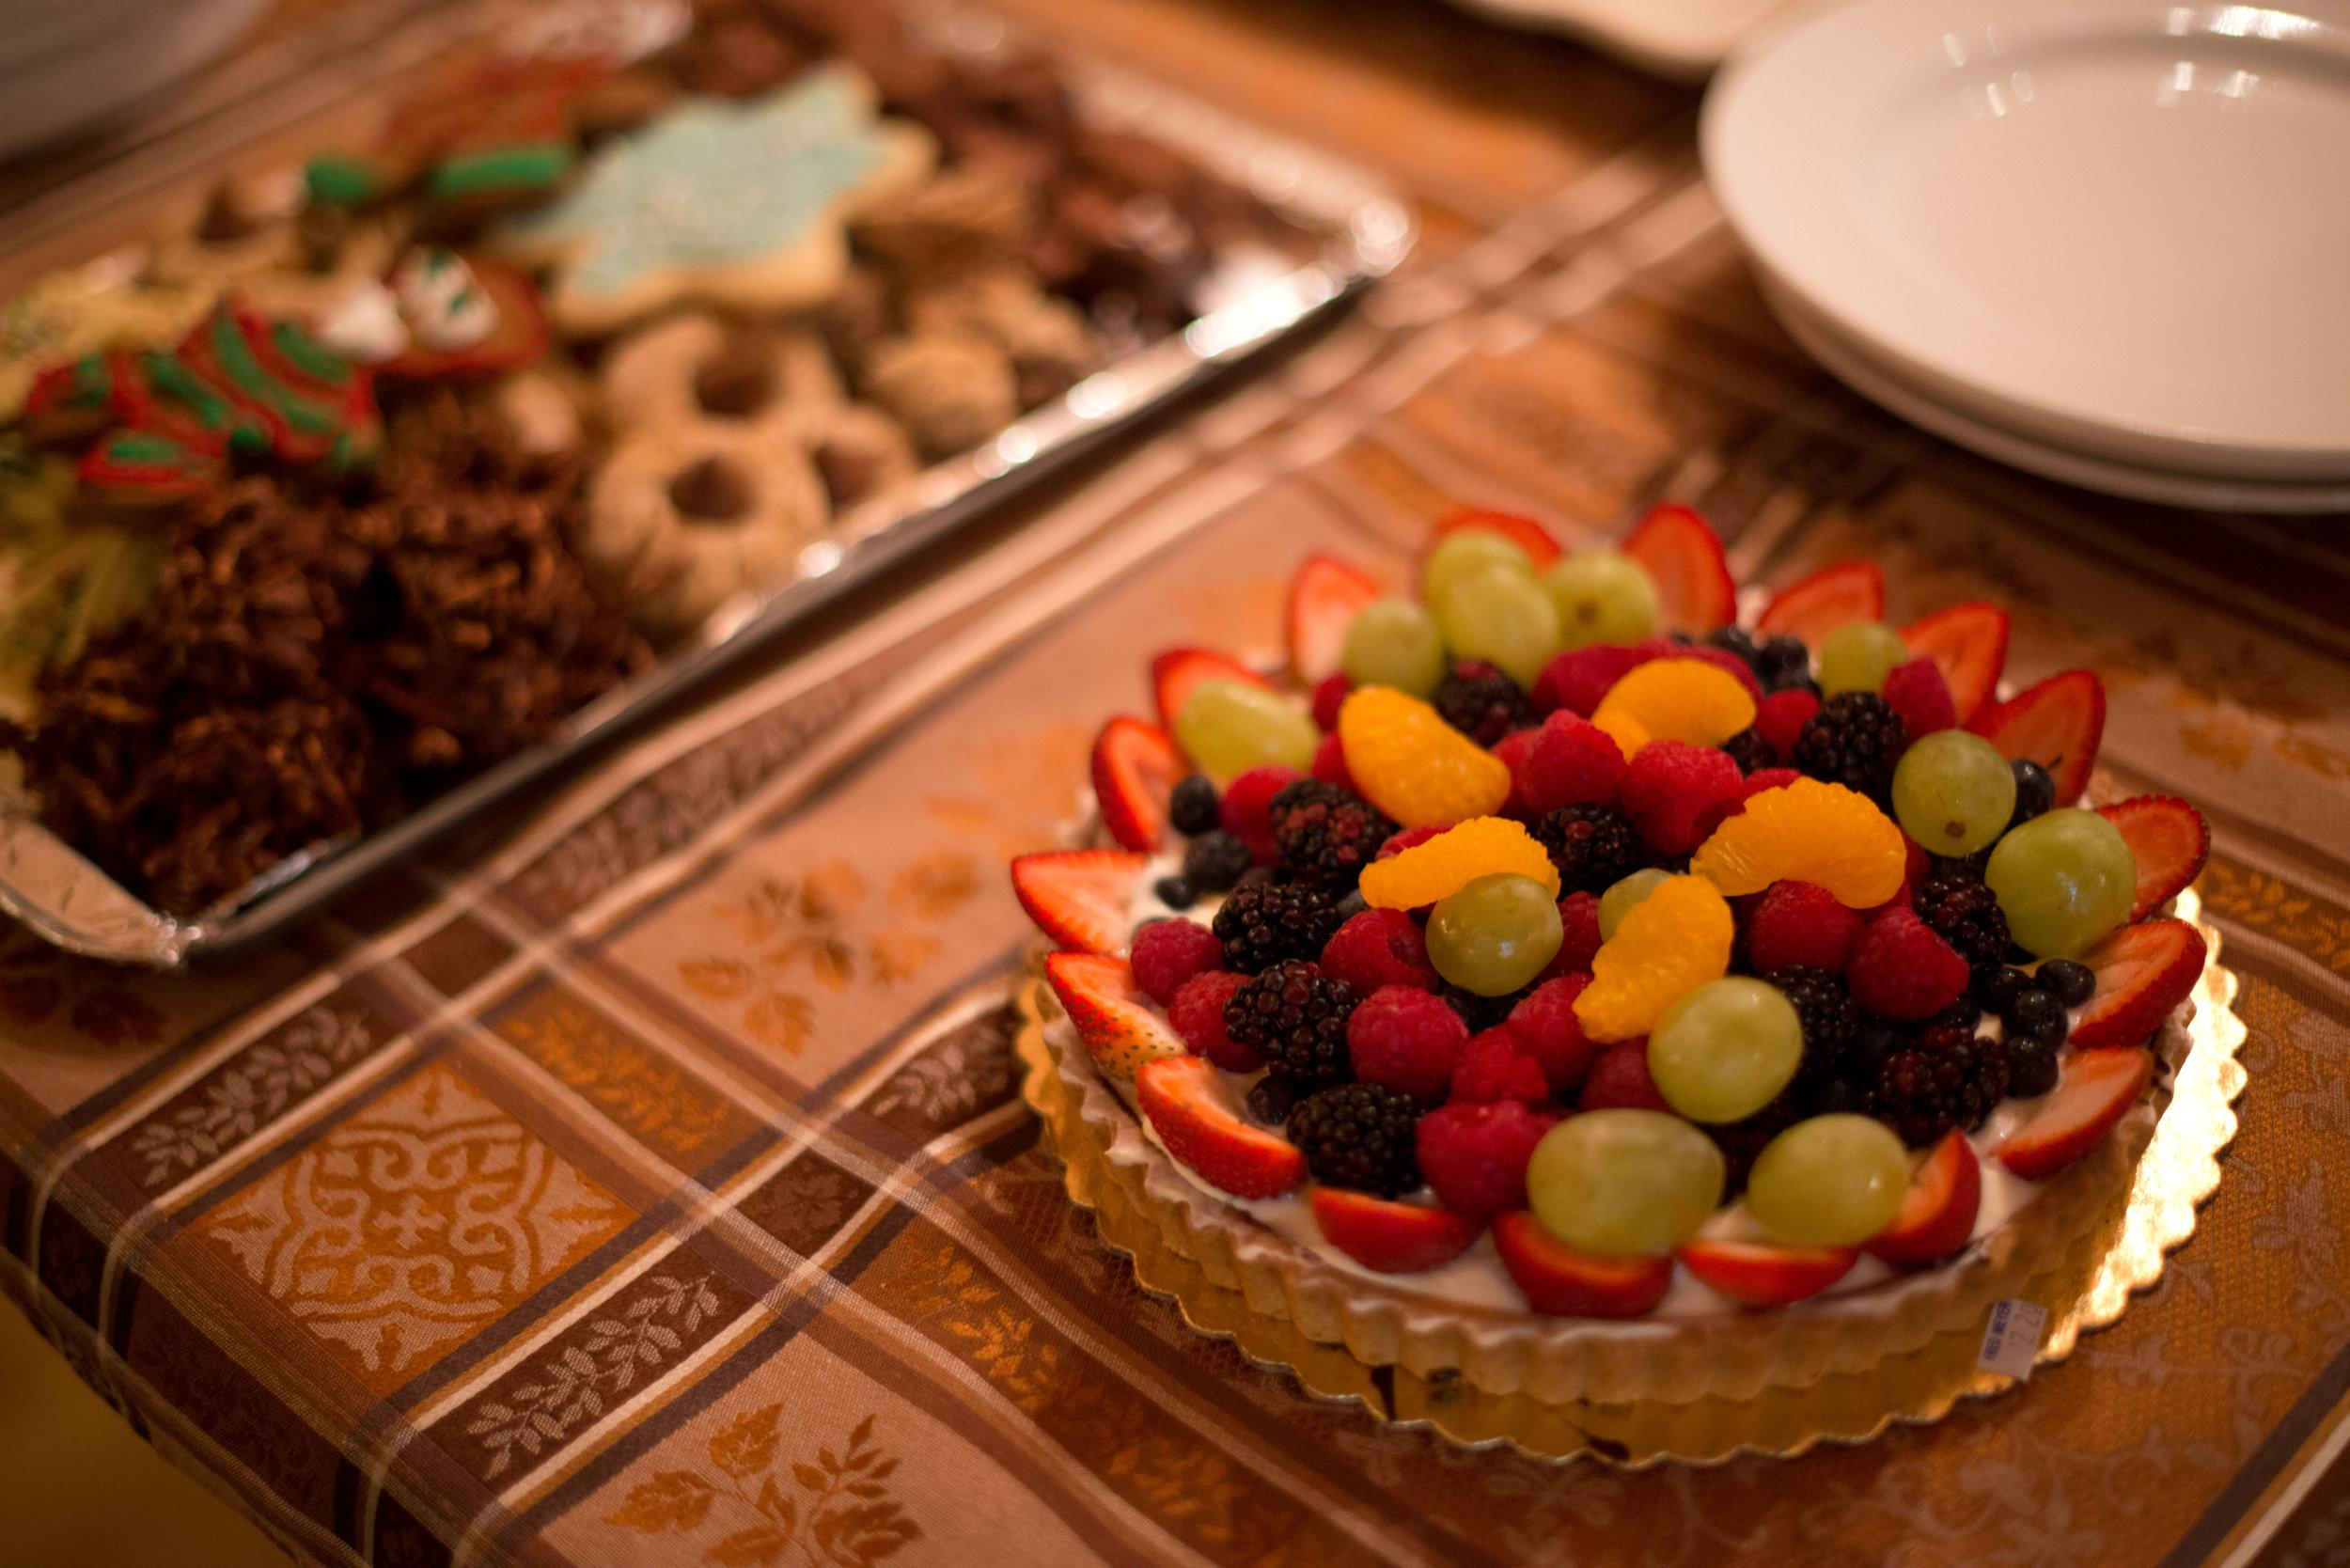 Beautiful desserts everyone brought